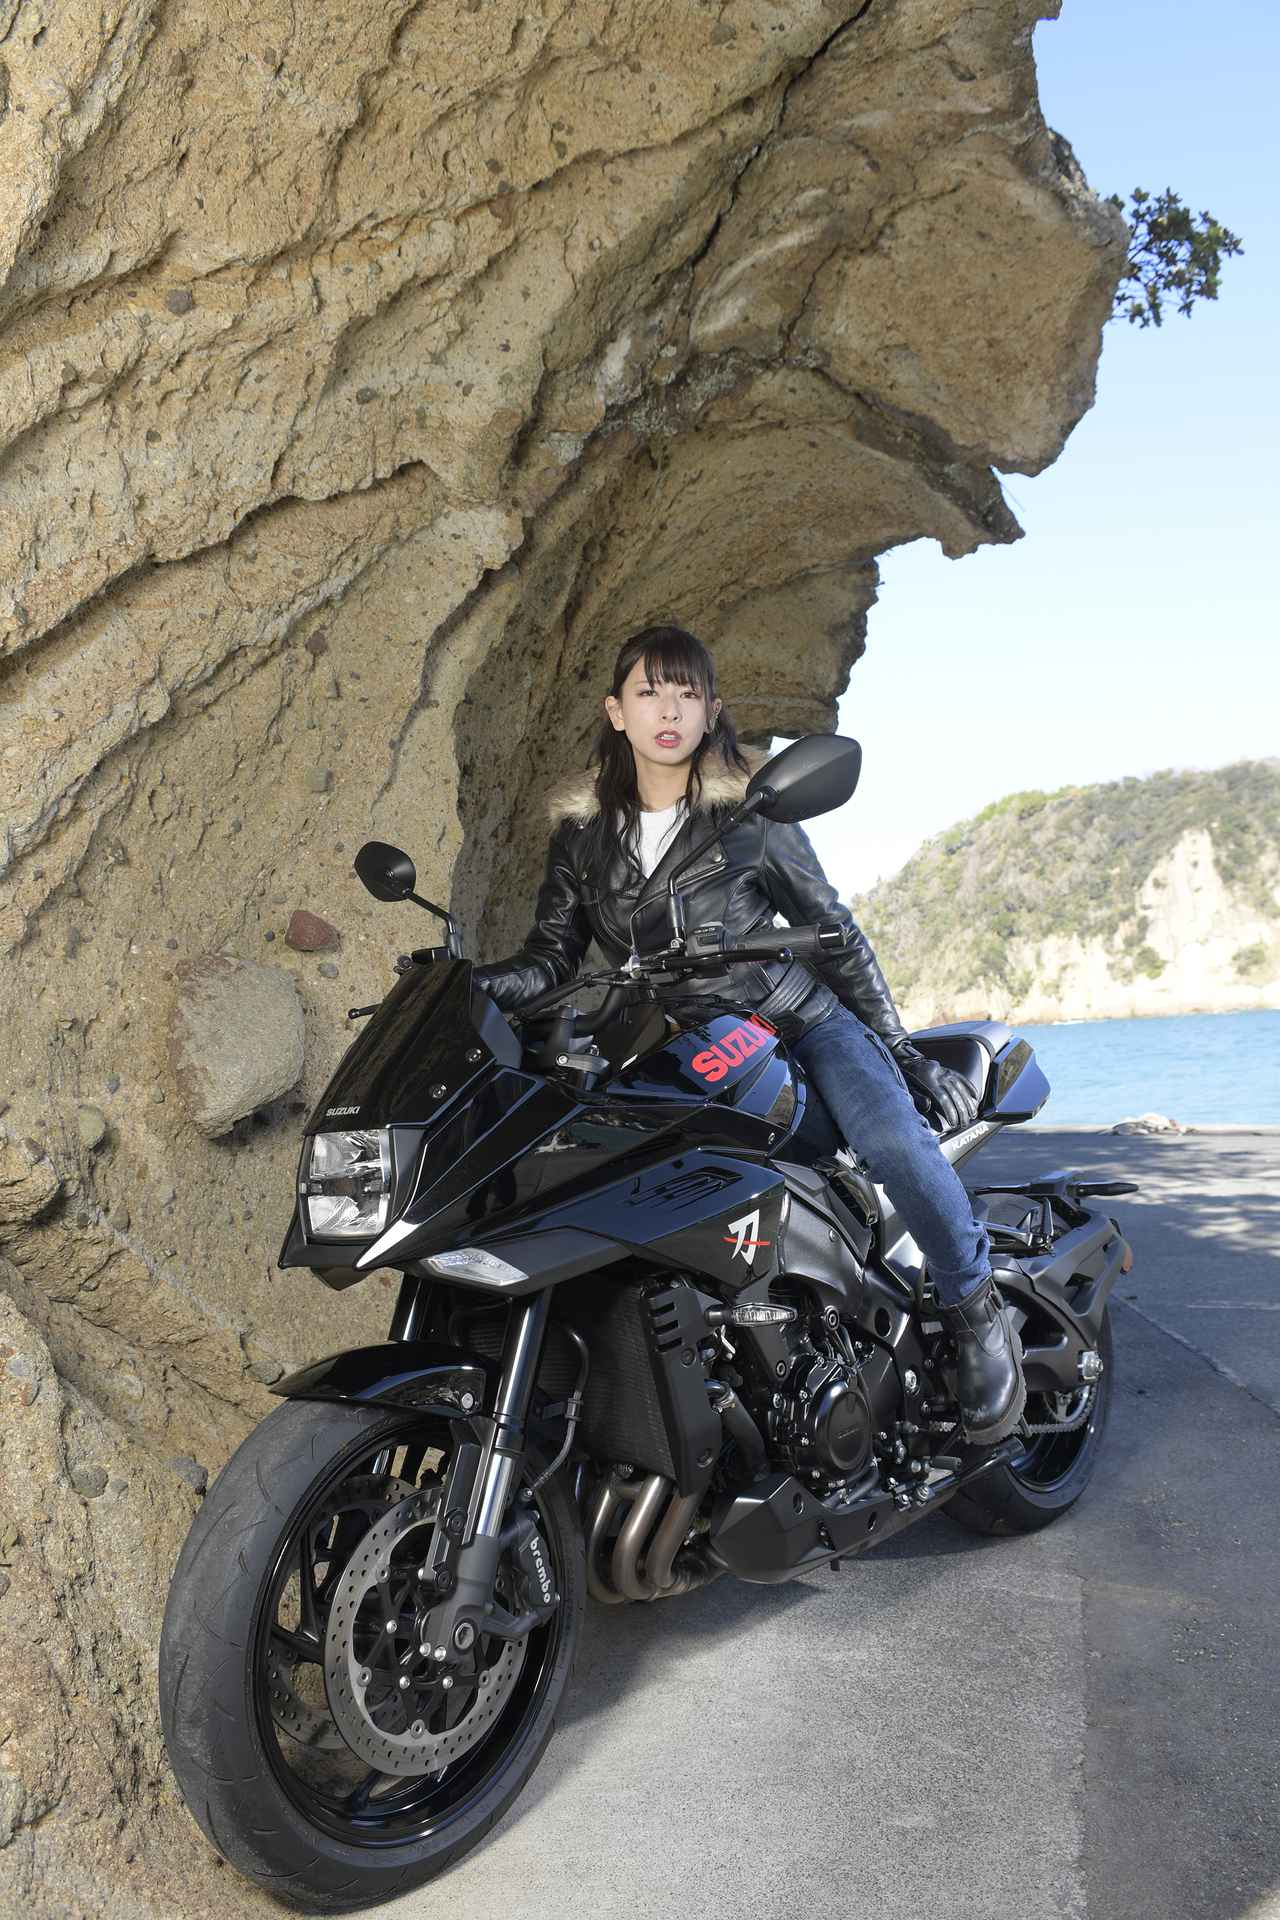 Images : 4番目の画像 - 葉月美優×KATANAの写真をもっと見る! - スズキのバイク!- 新車情報や最新ニュースをお届けします